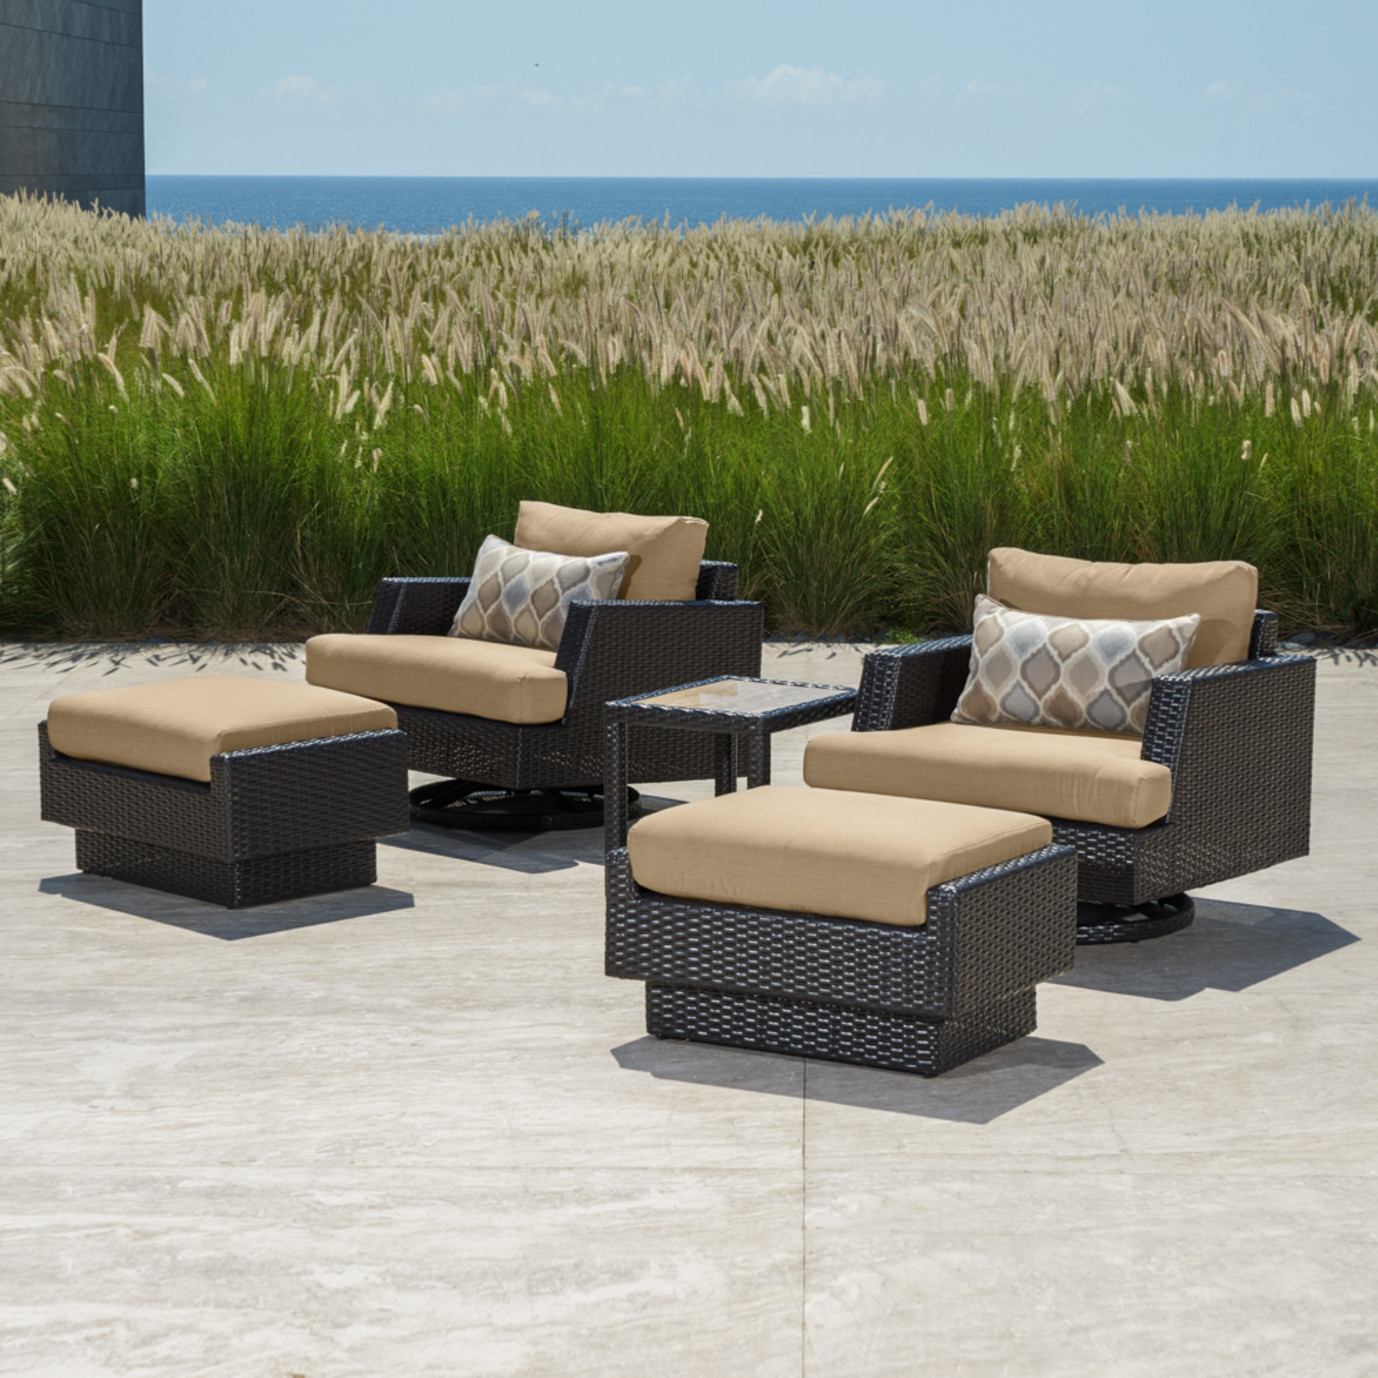 Portofino™ Comfort 5pc Motion Club Chair Set - Heather Beige